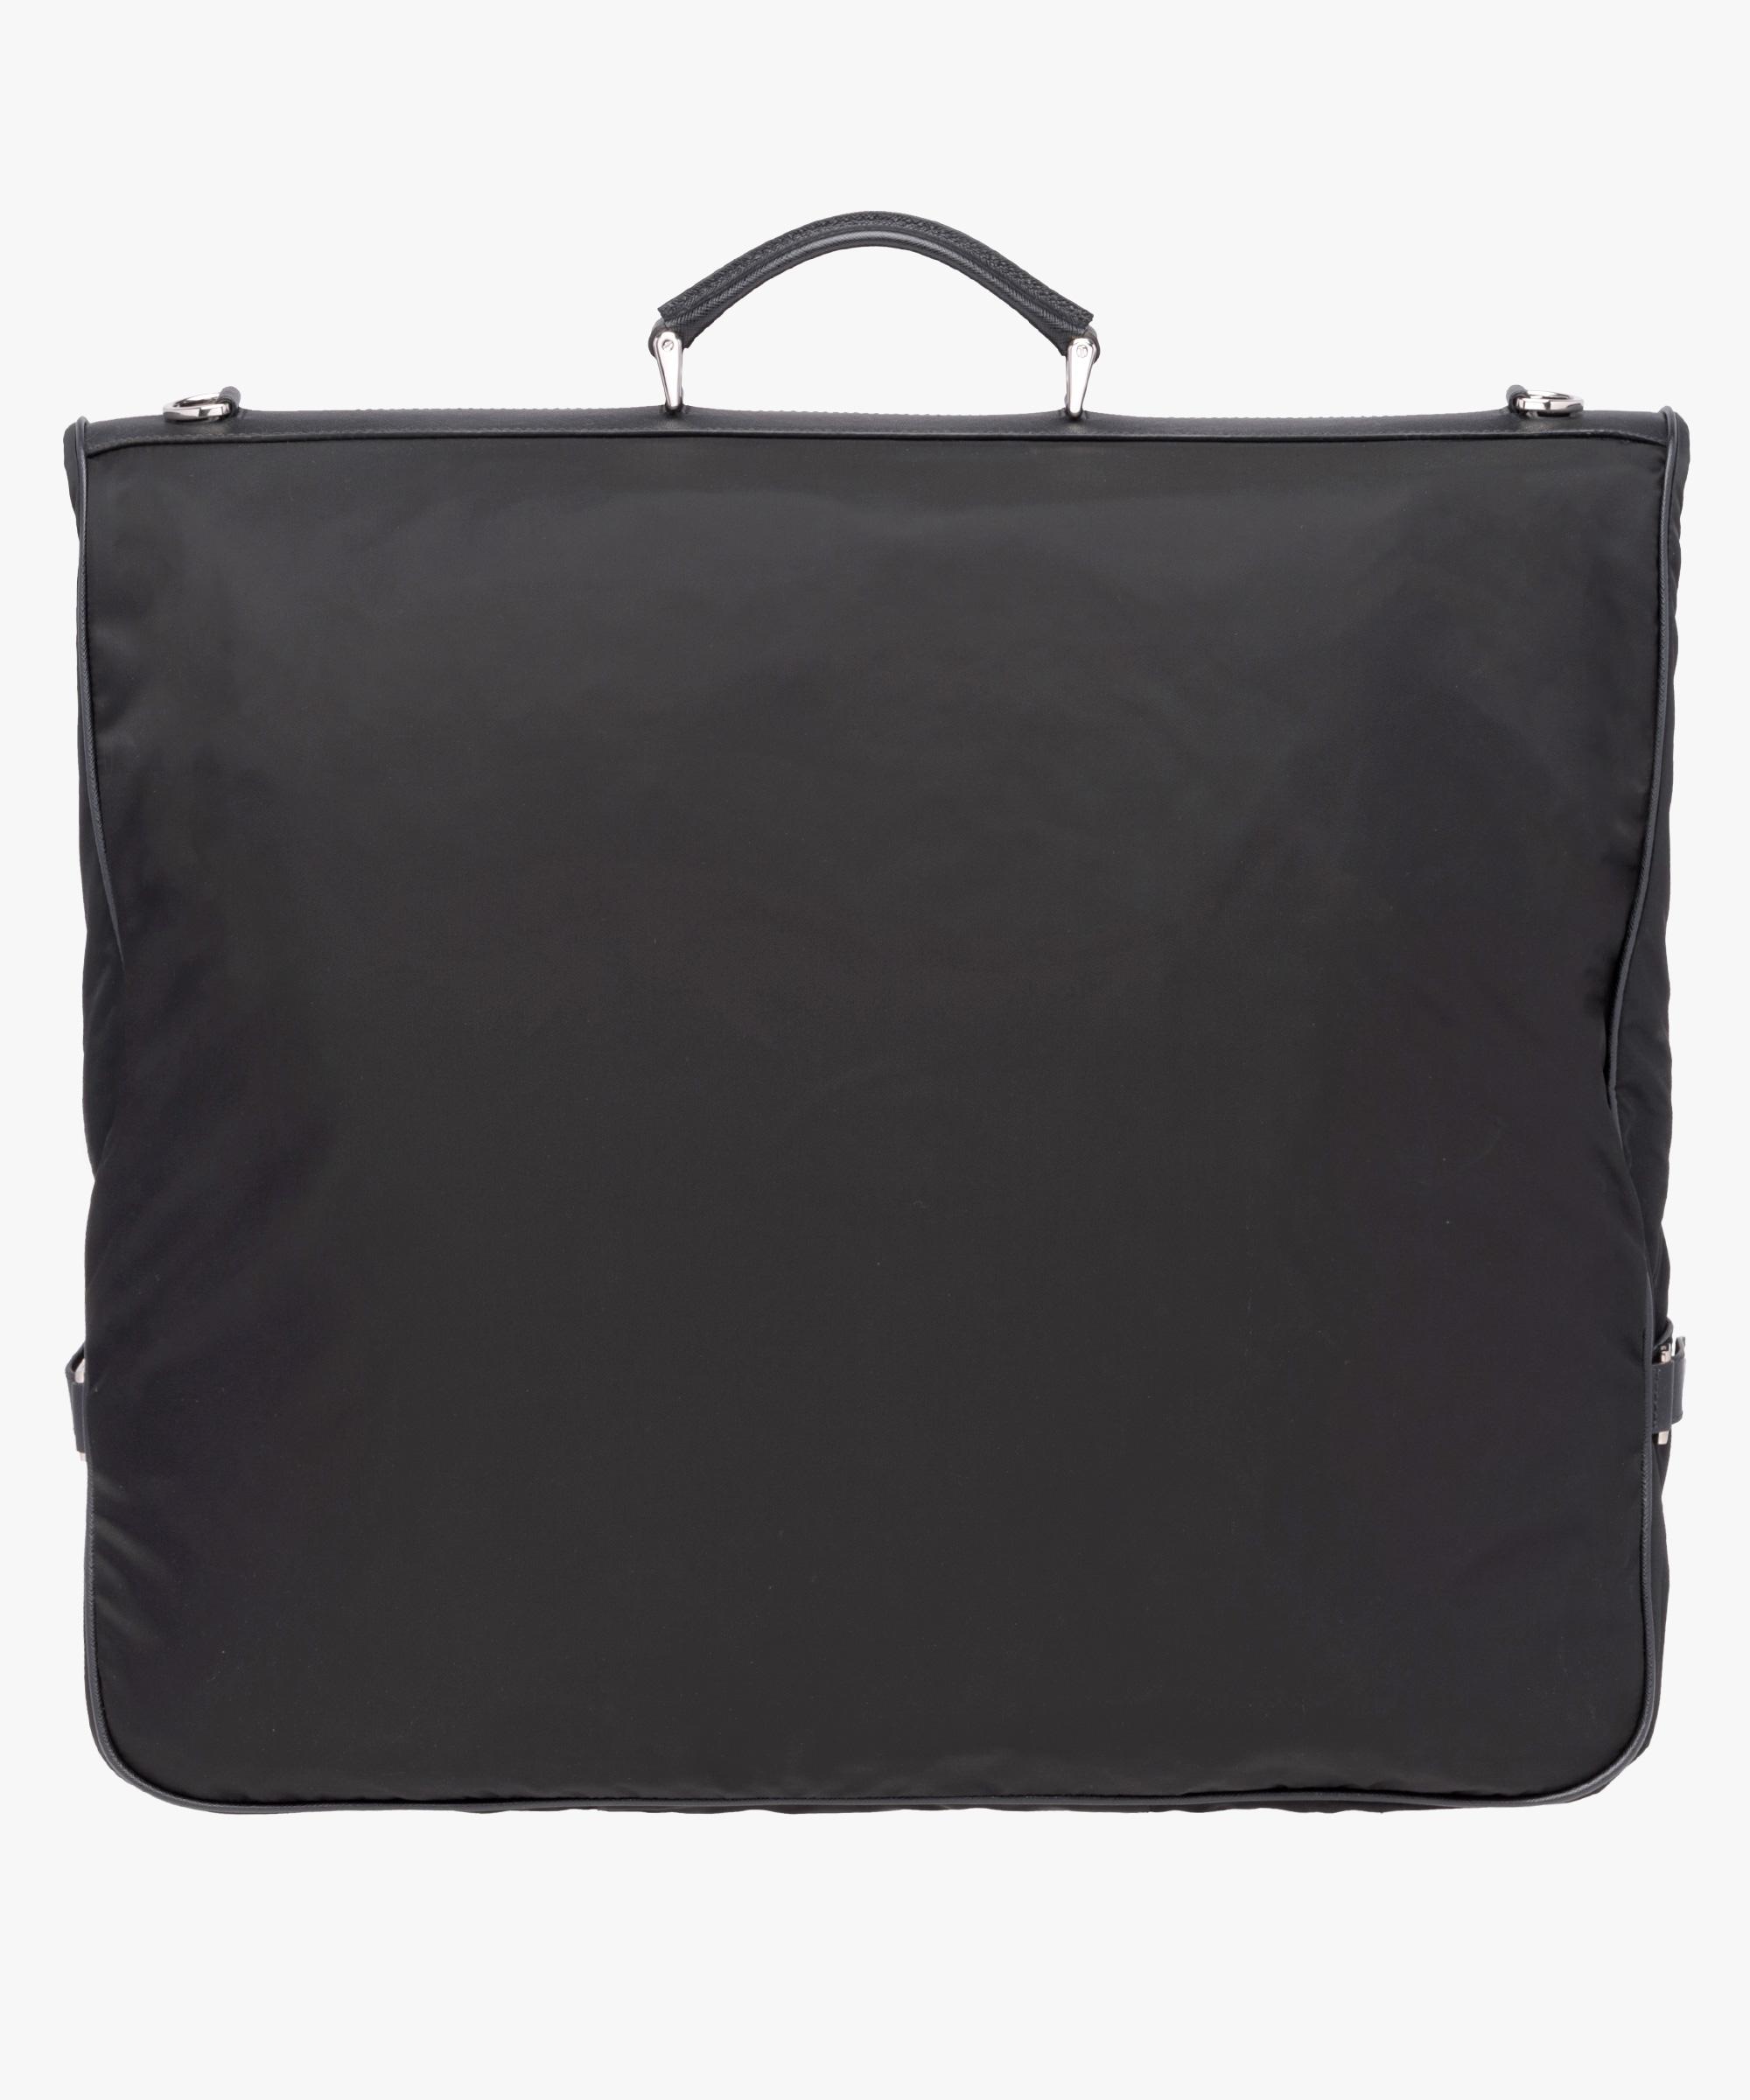 6c3e3f052004 ... Saffiano leather and nylon garment bag Prada BLACK ...